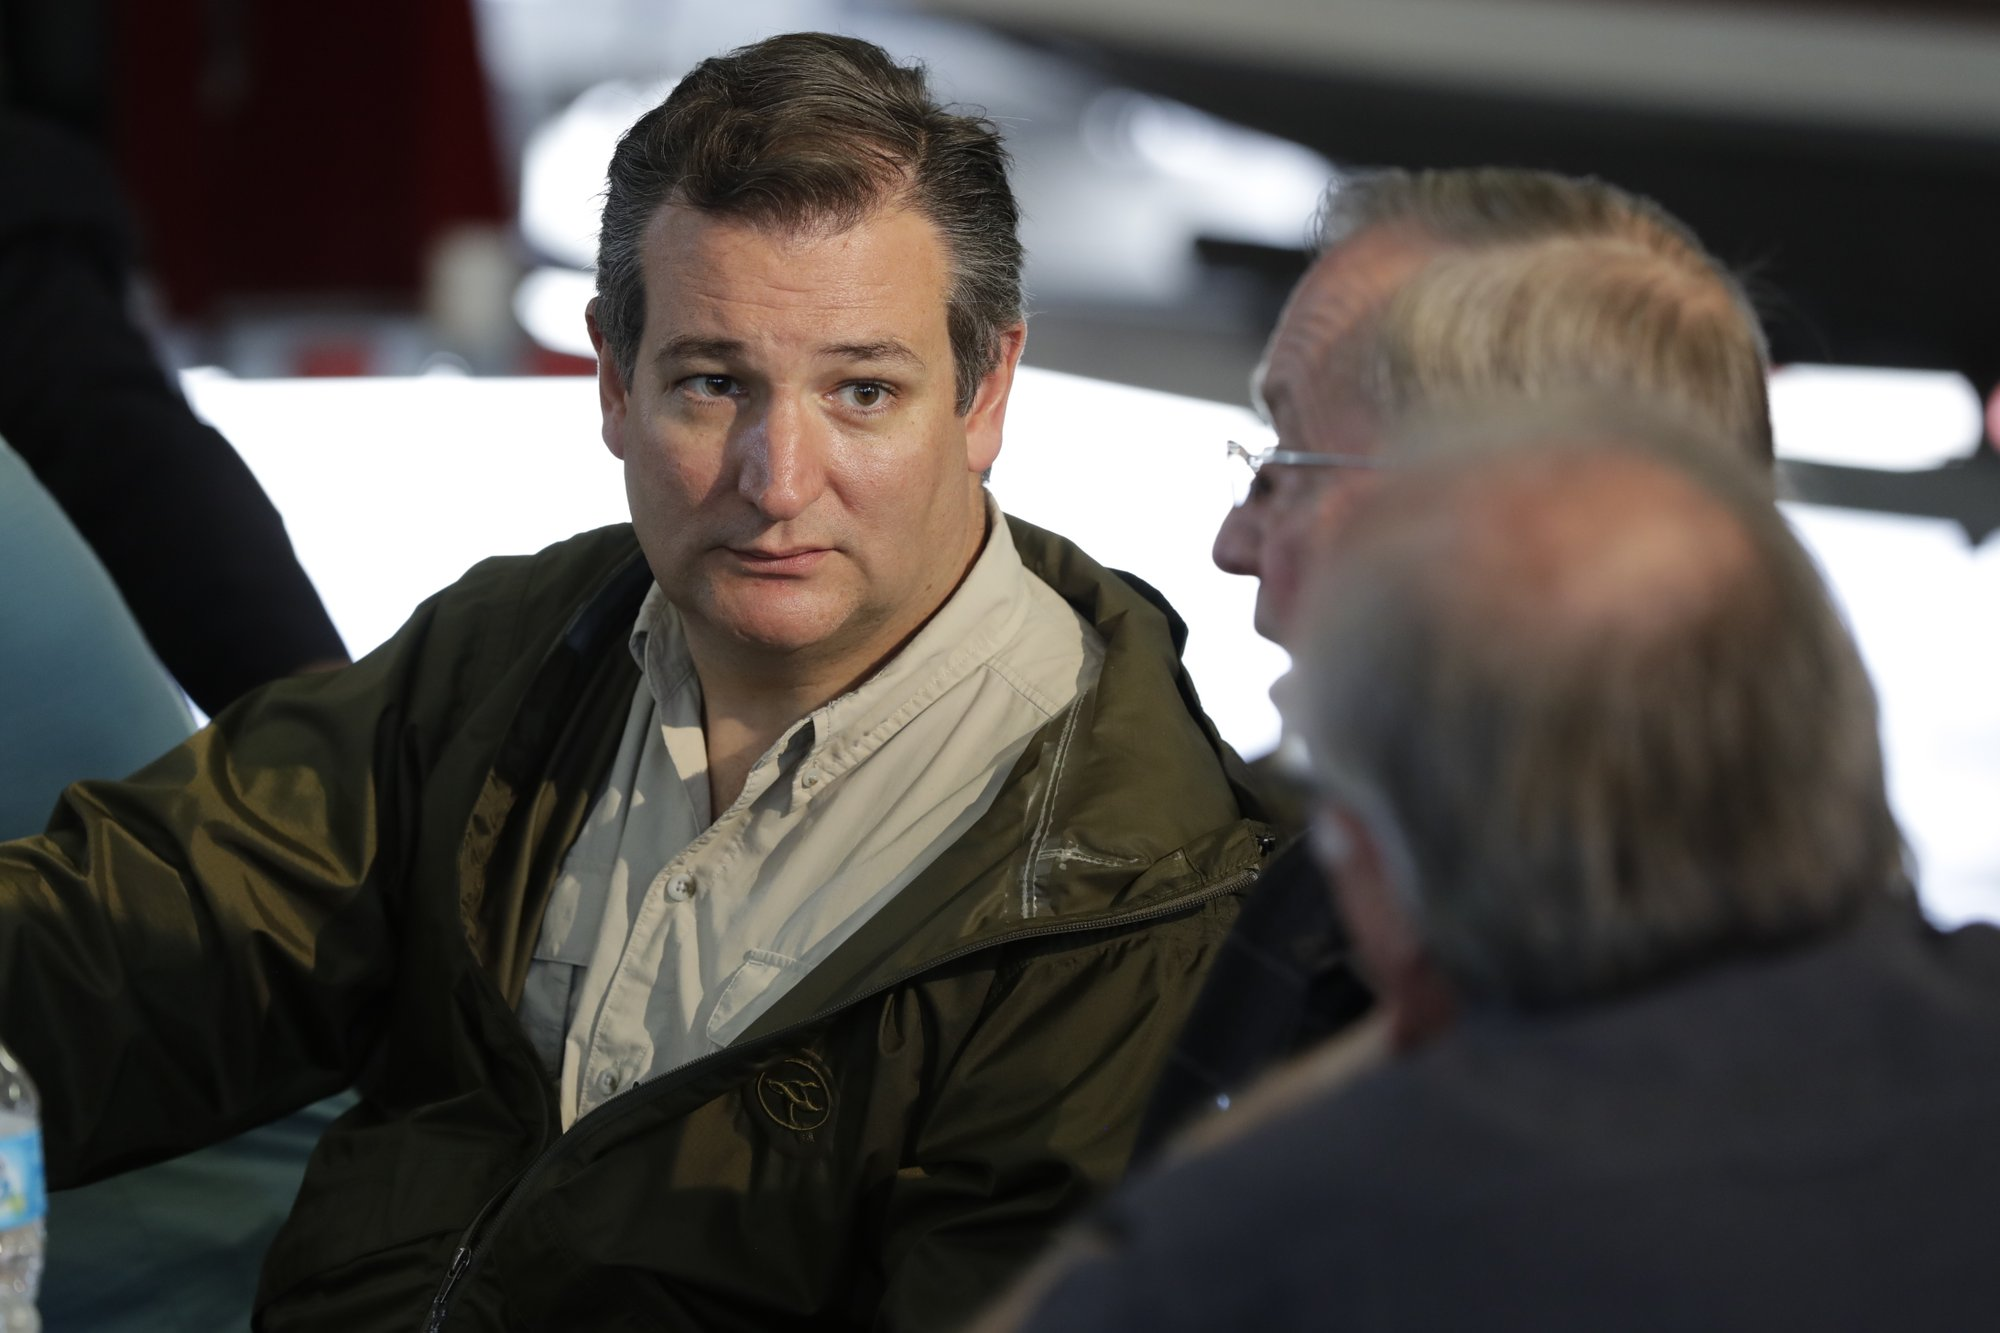 Bad blood lingers in GOP as Congress ponders Harvey relief